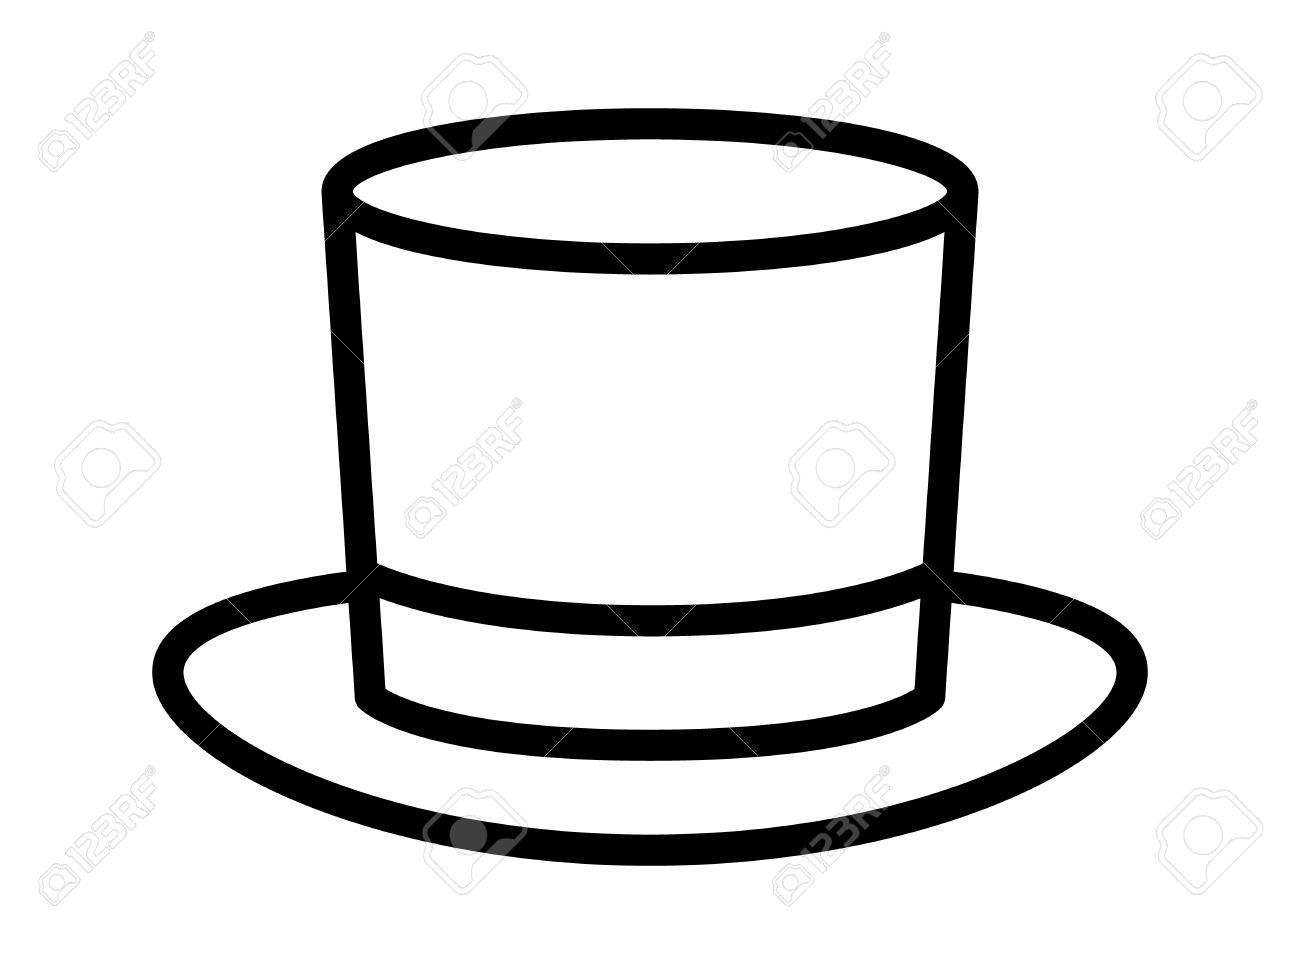 Top Hat Outline 7.